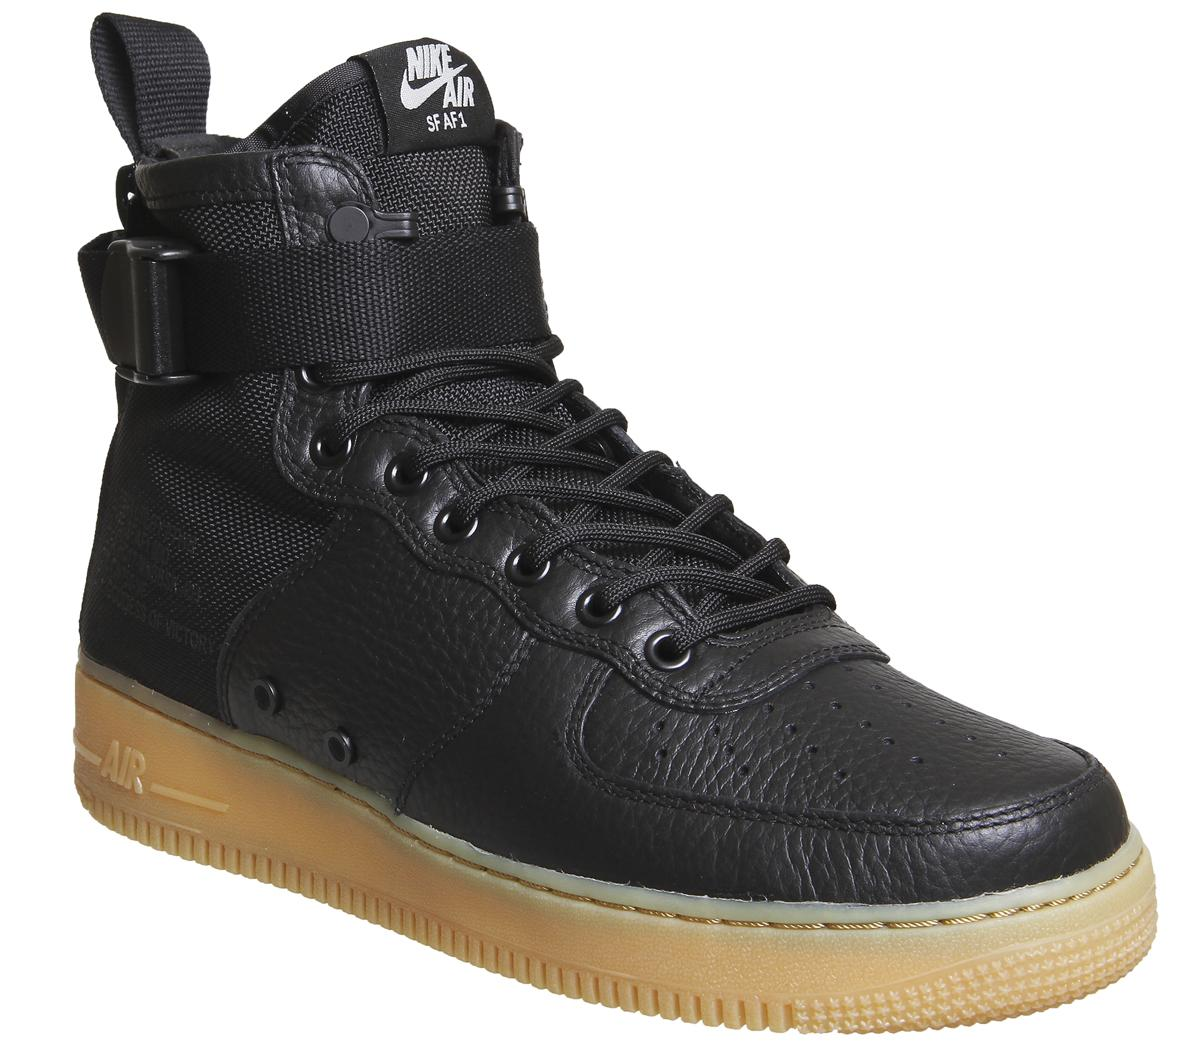 Nike Sf Af1 Mid 17 Black Black Gum